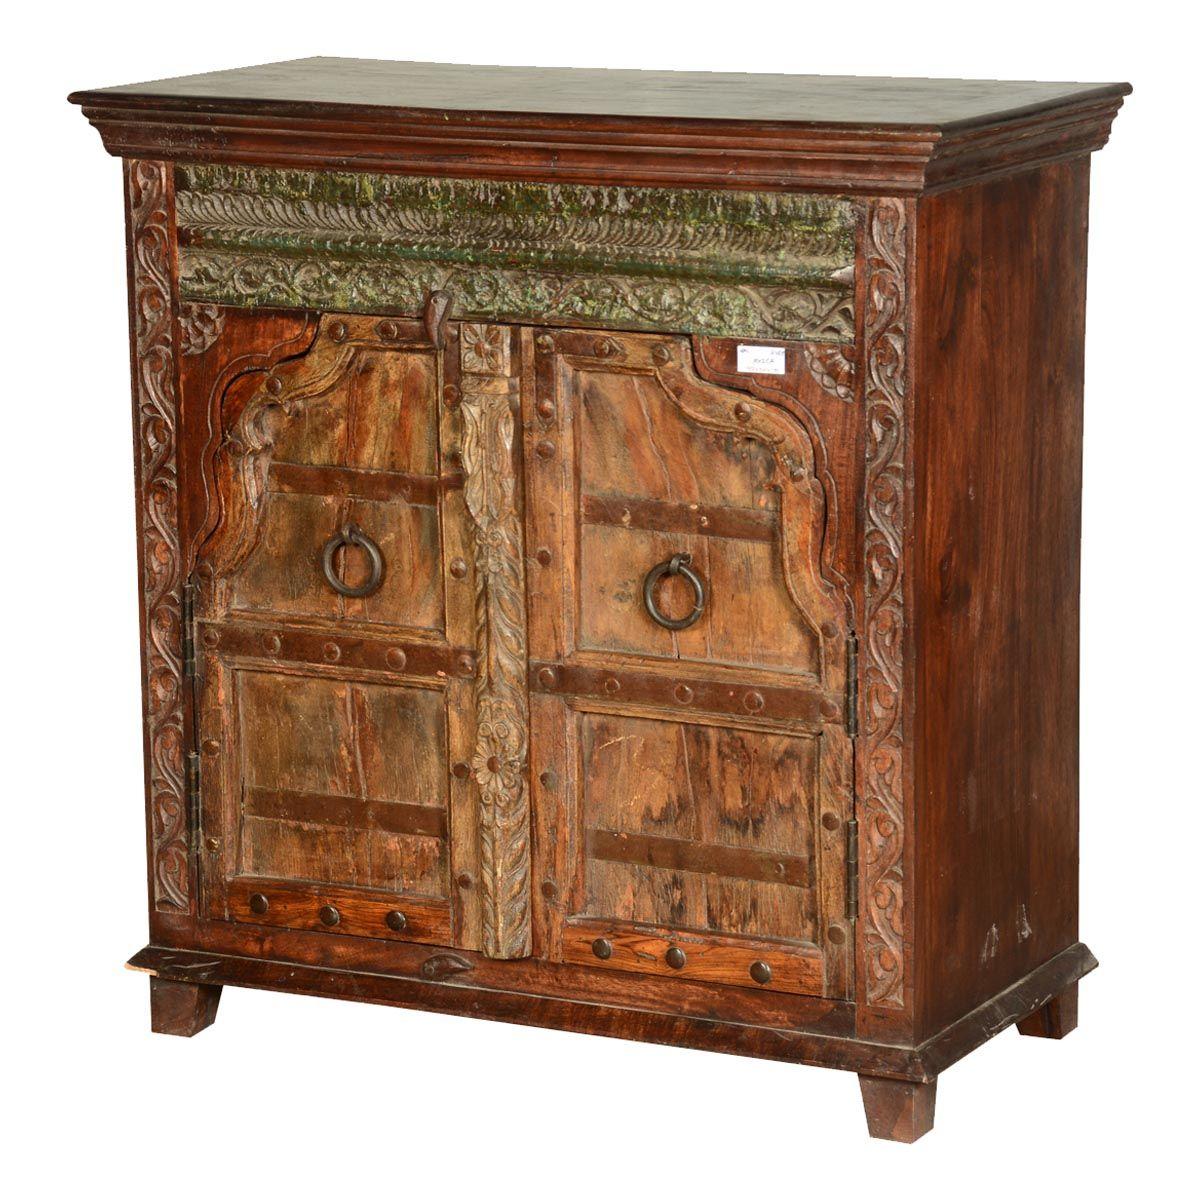 Sierra Living Concepts Rustic Farmhouse Furniture Reclaimed Wood Furniture Wood